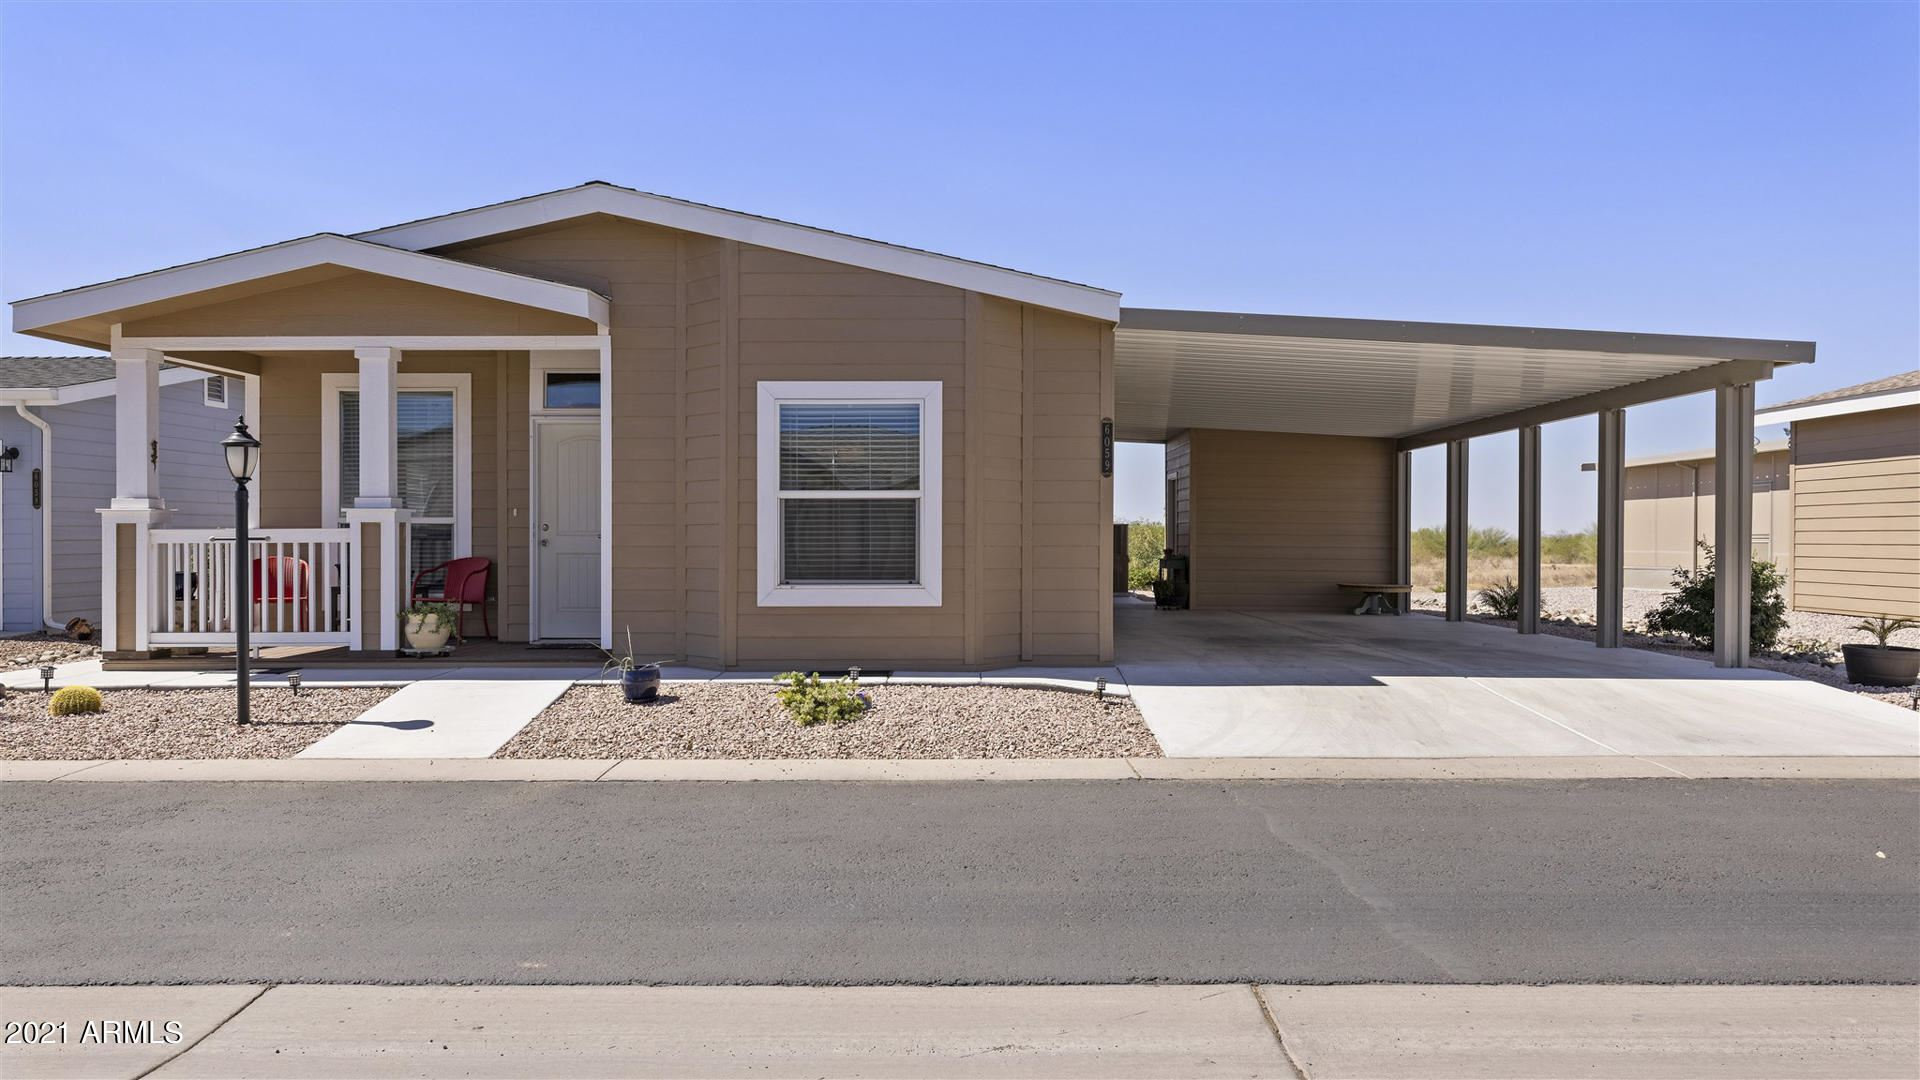 3301 S GOLDFIELD Road #6059, Apache Junction, AZ 85119 - #: 6252198